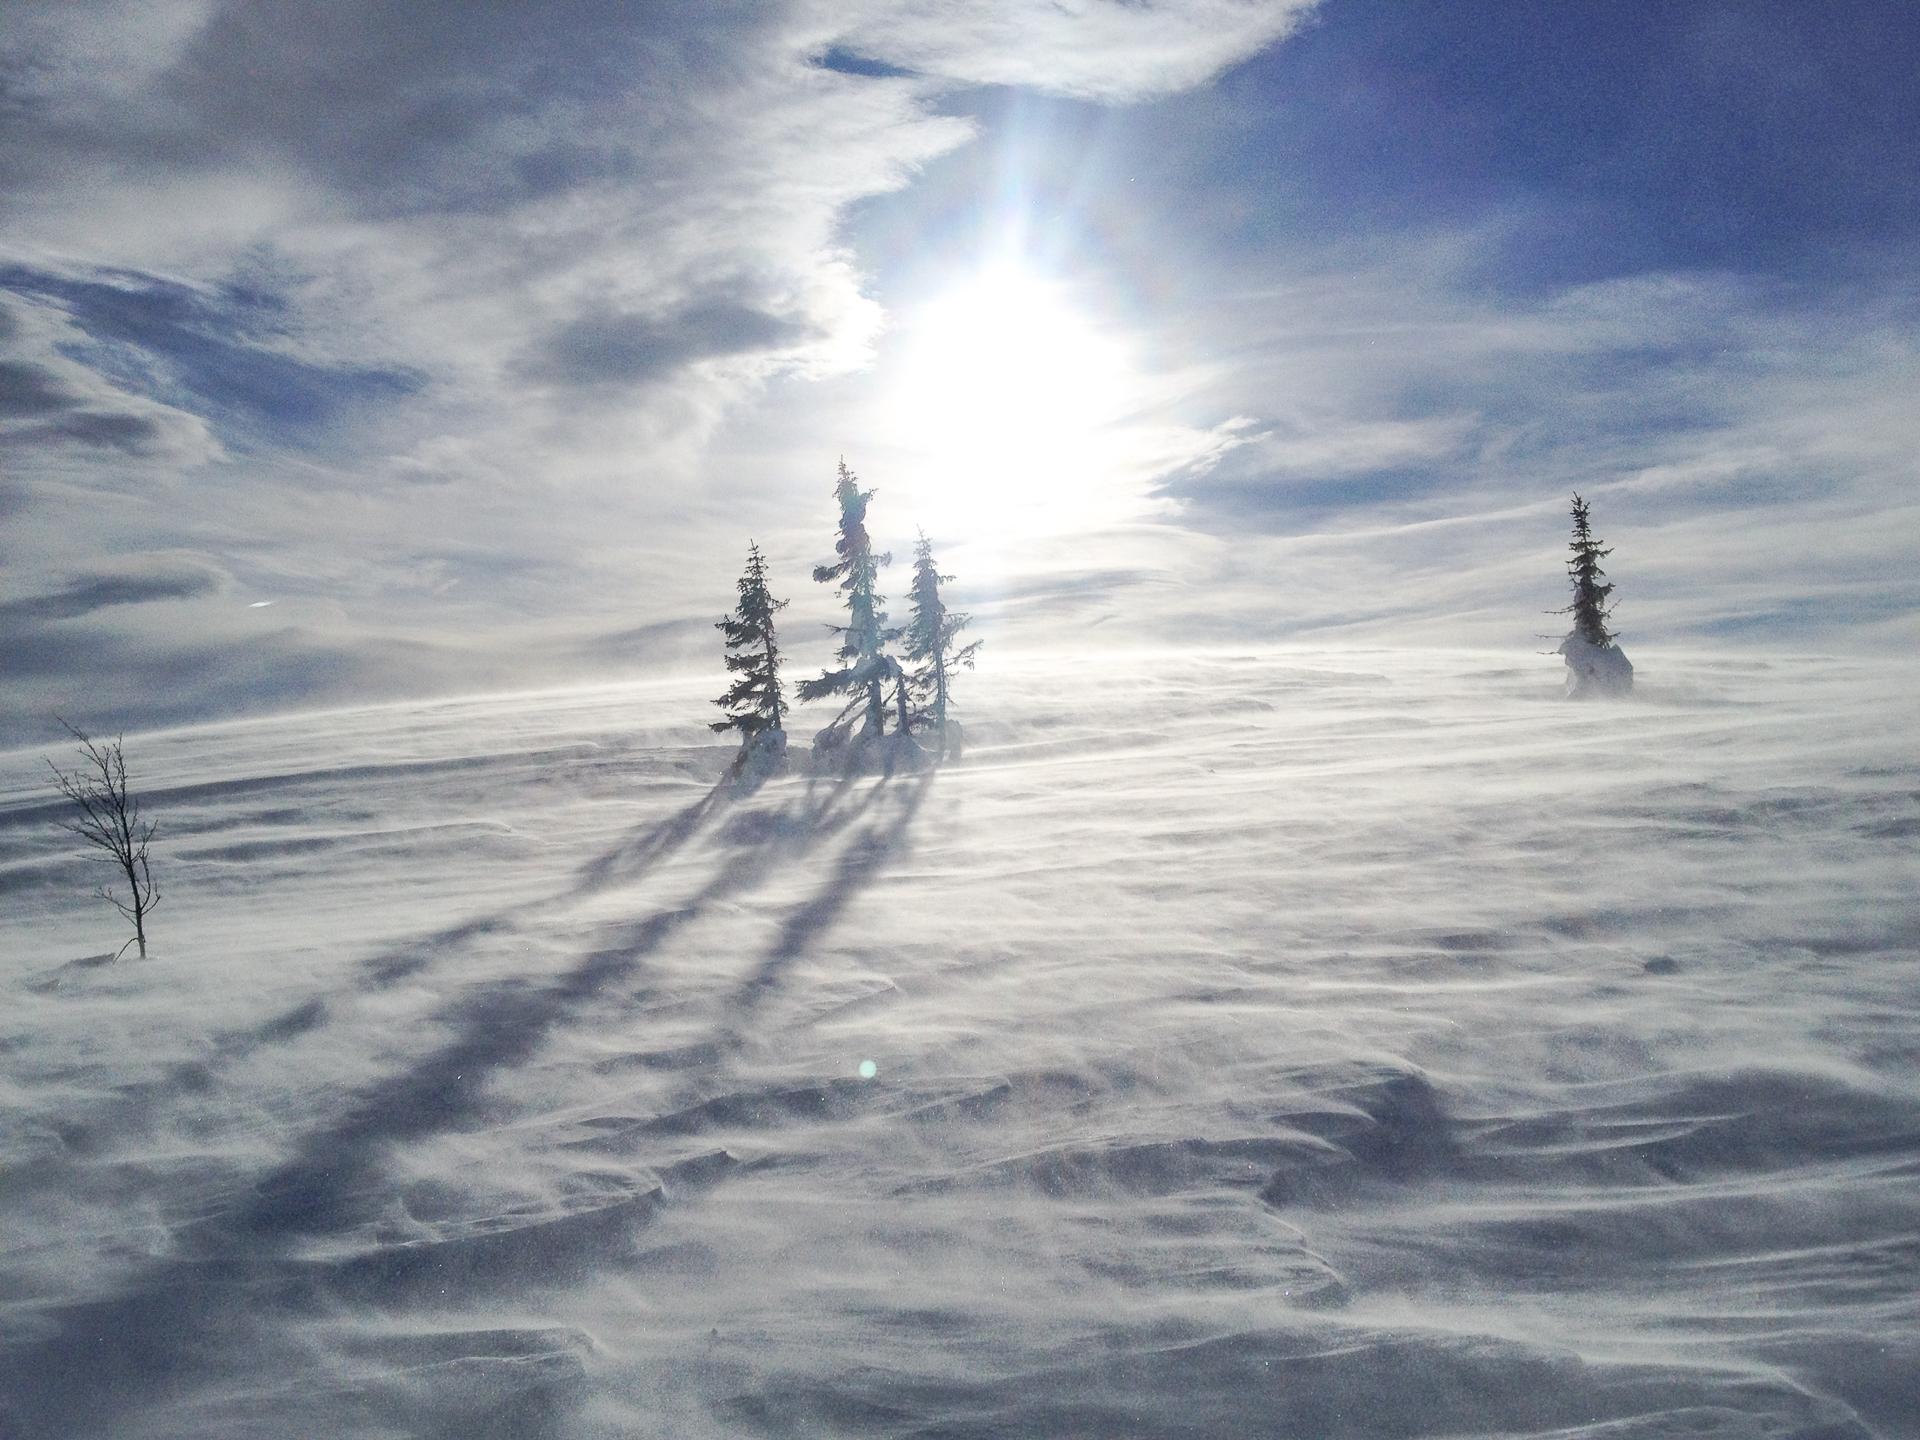 vinter2014.trugetur